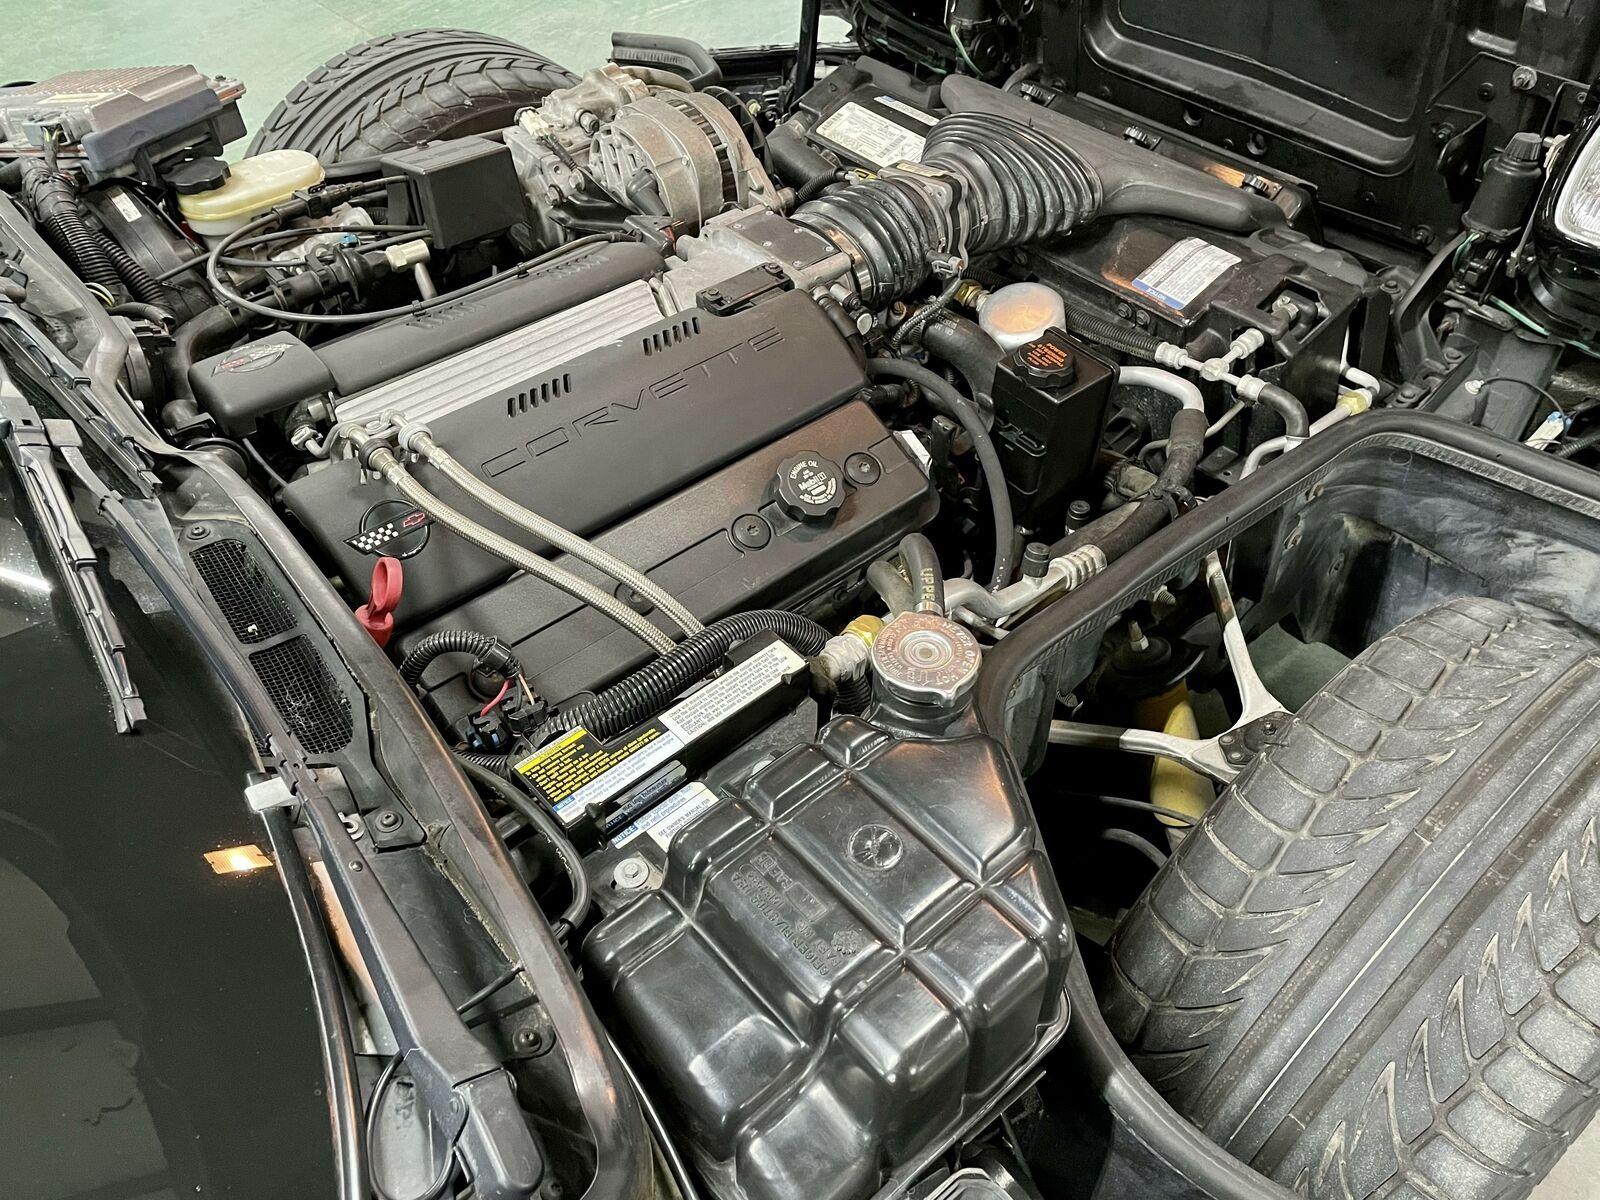 1996 Black Chevrolet Corvette     C4 Corvette Photo 10